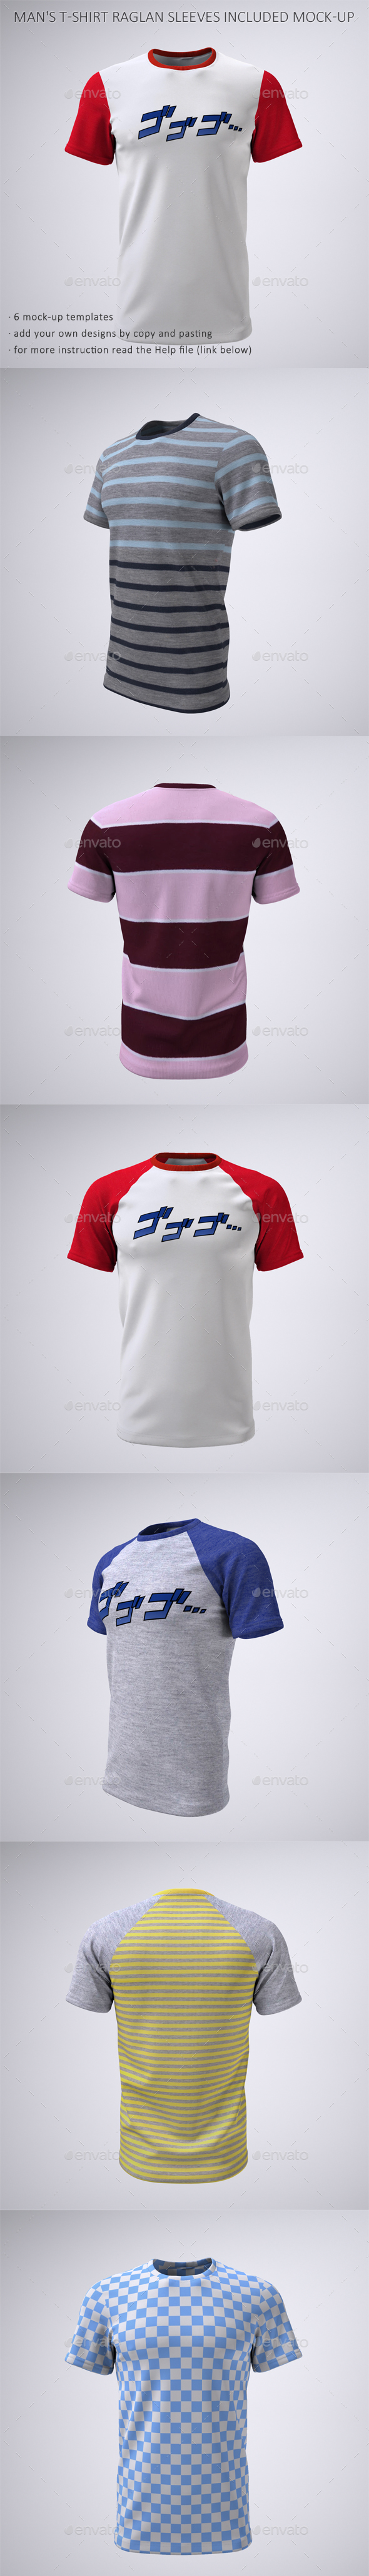 T-Shirt With Short or Raglan Sleeves Mock-Up - T-shirts Apparel